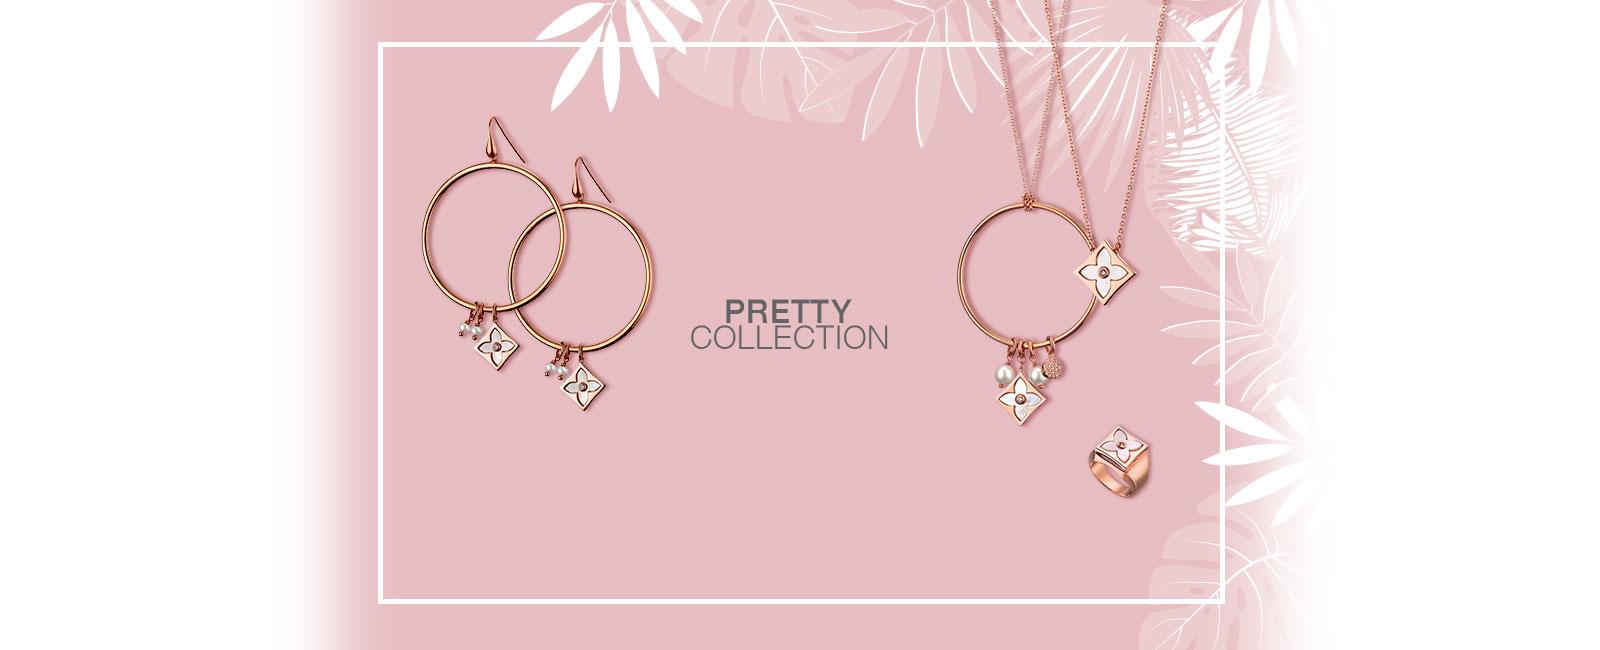 Pretty Collection - Loisir